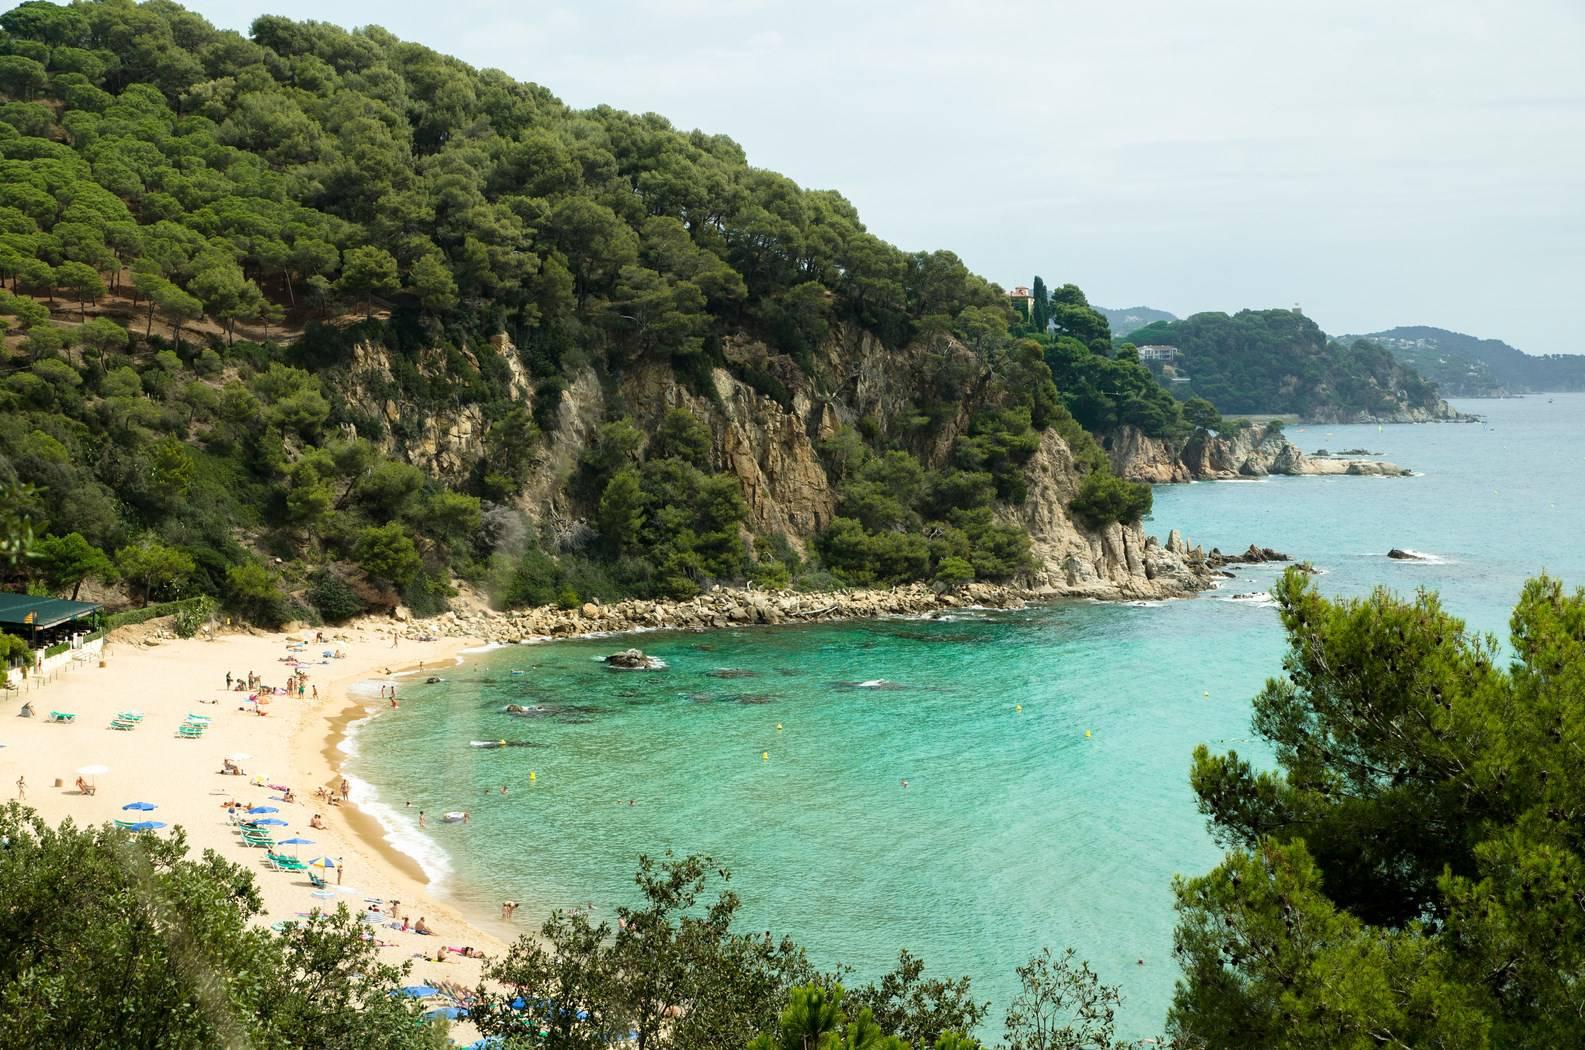 Пляж санта кристина в ллорет де мар фото